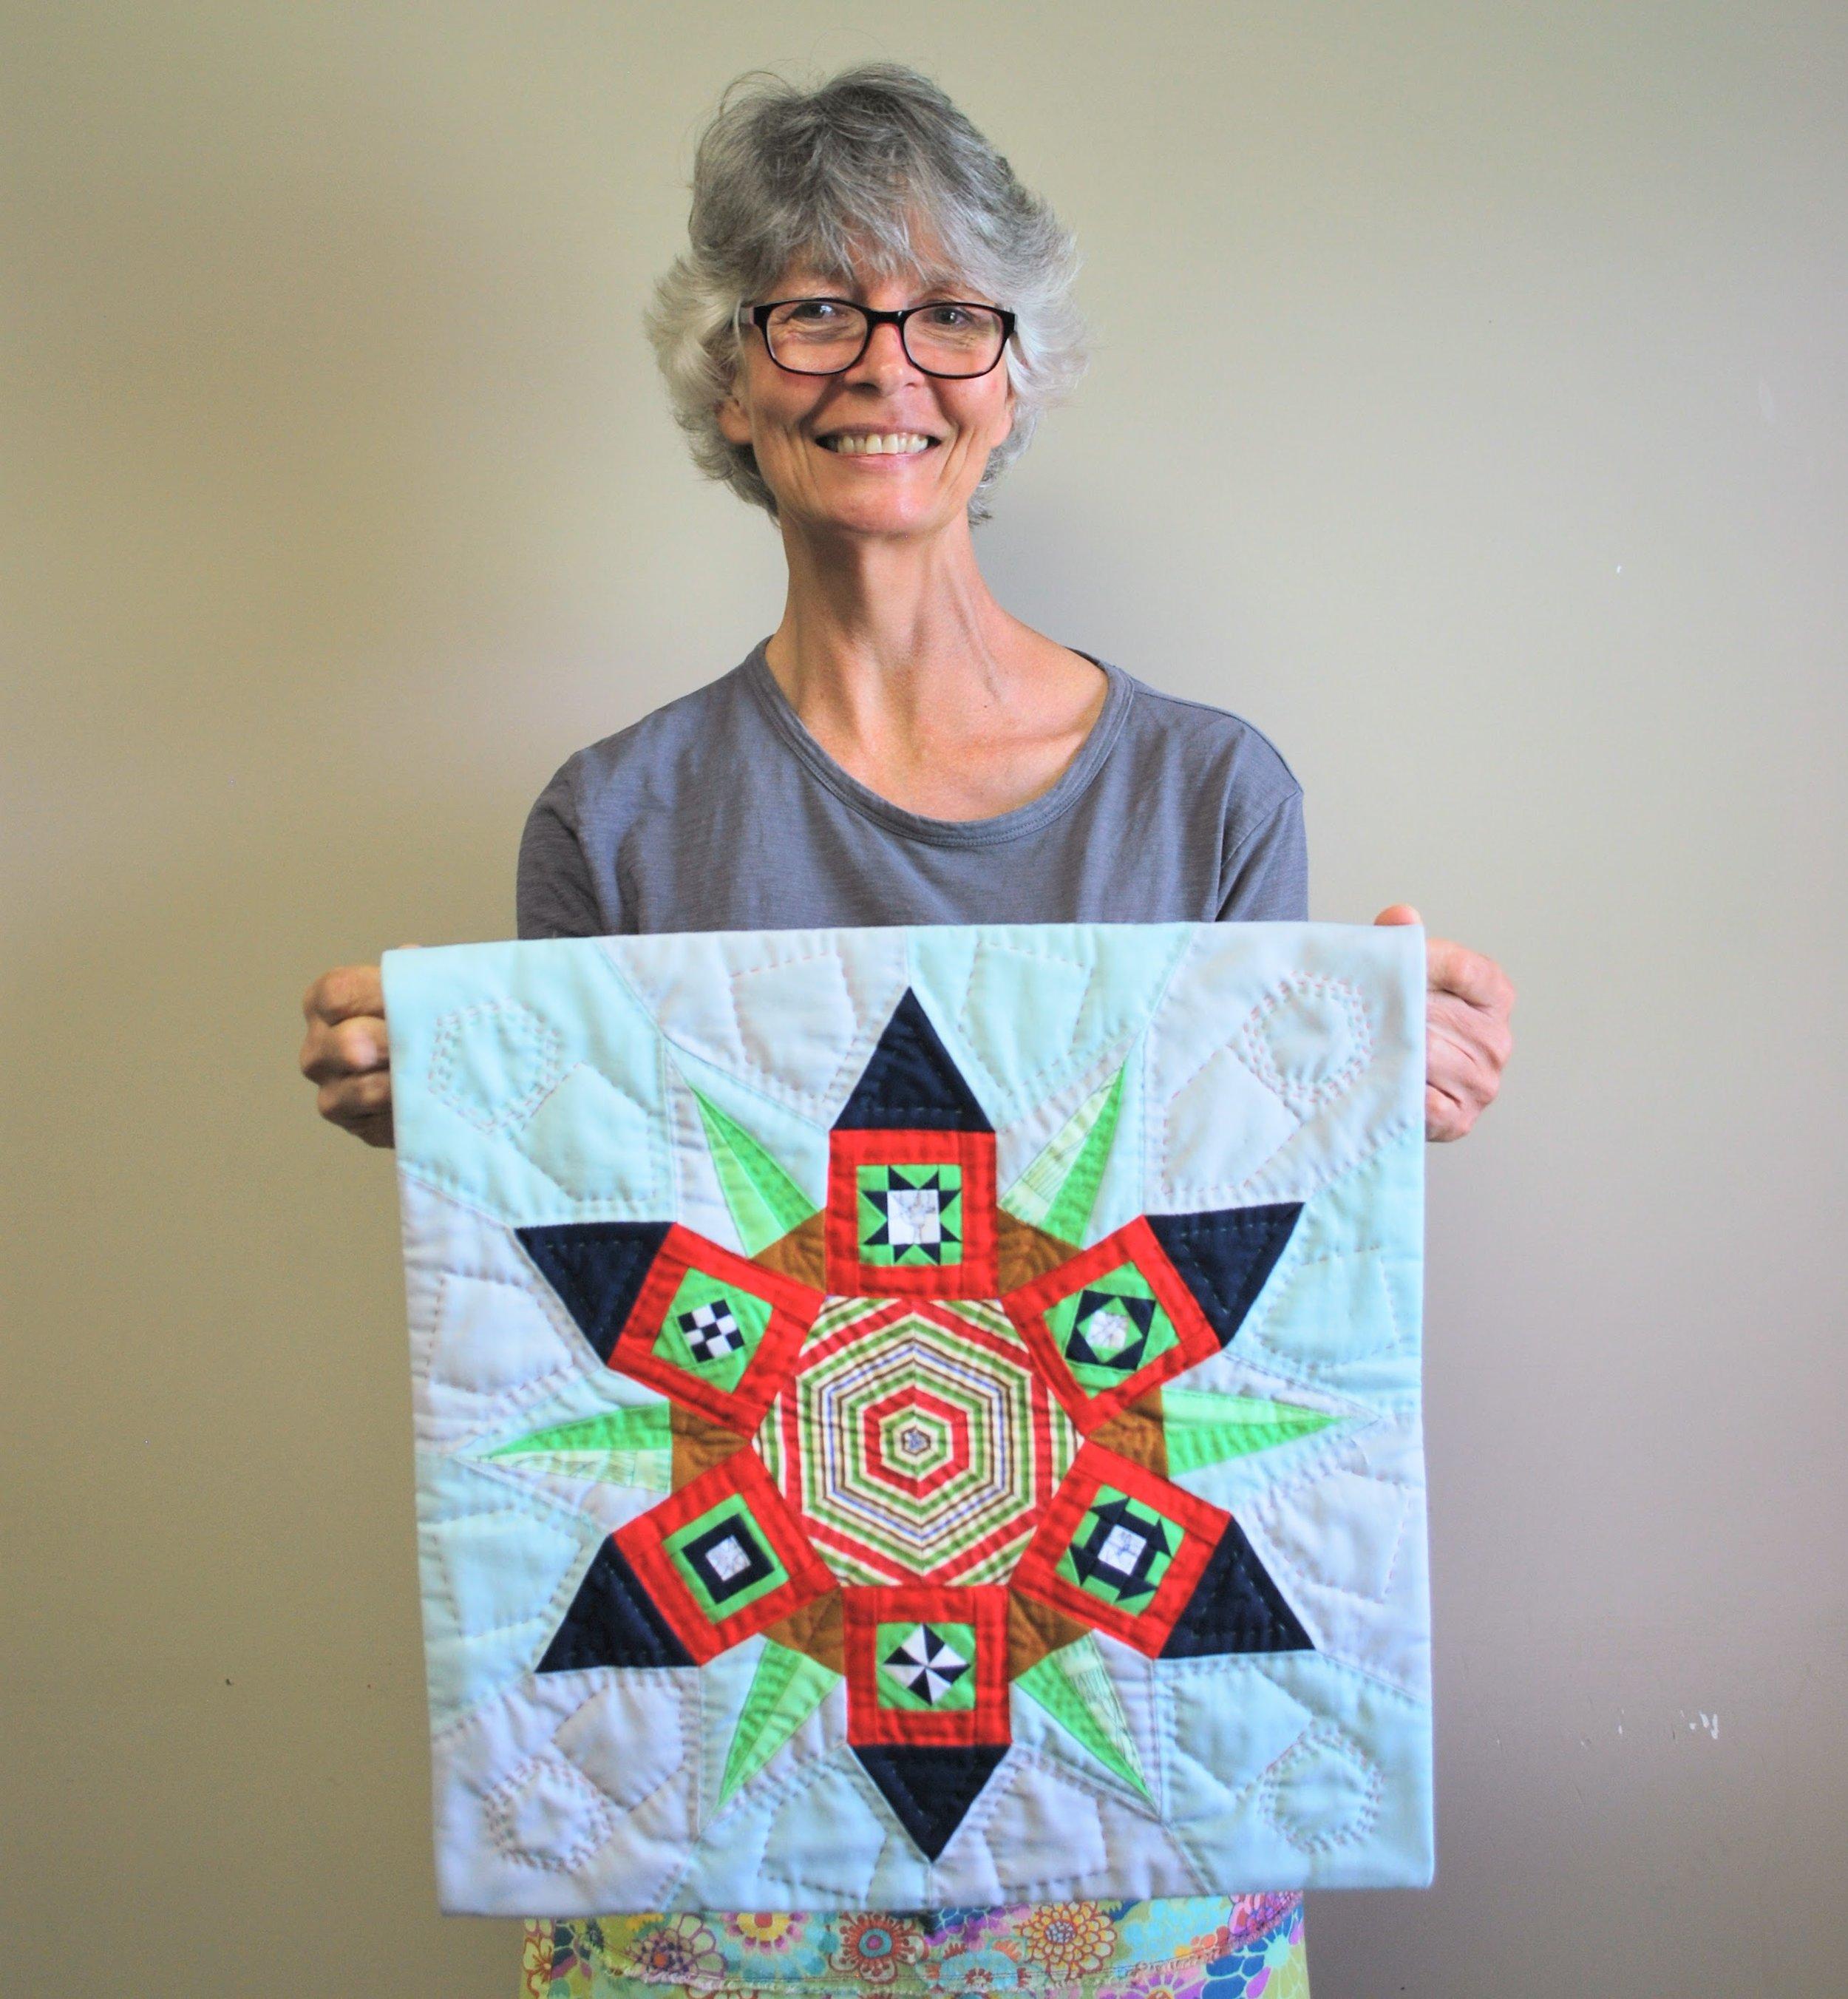 Quilt by Audrey Workman